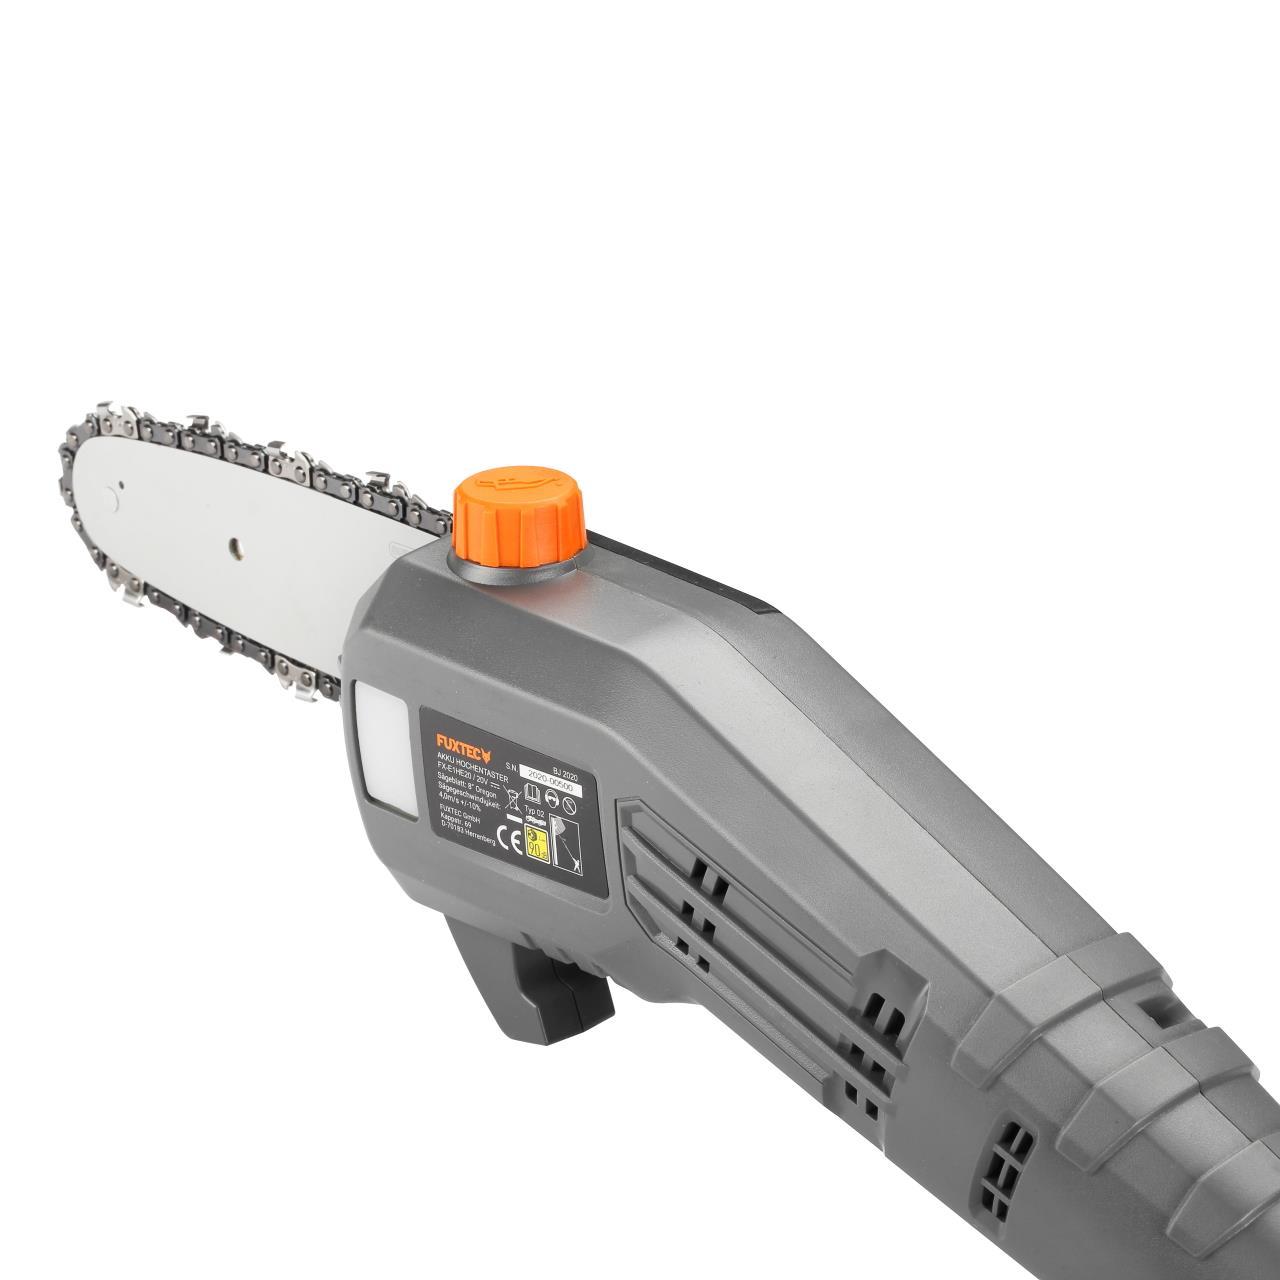 20V Akku Hochentaster FX-E1HE20 FUXTEC - ohne Akku/Ladegerät